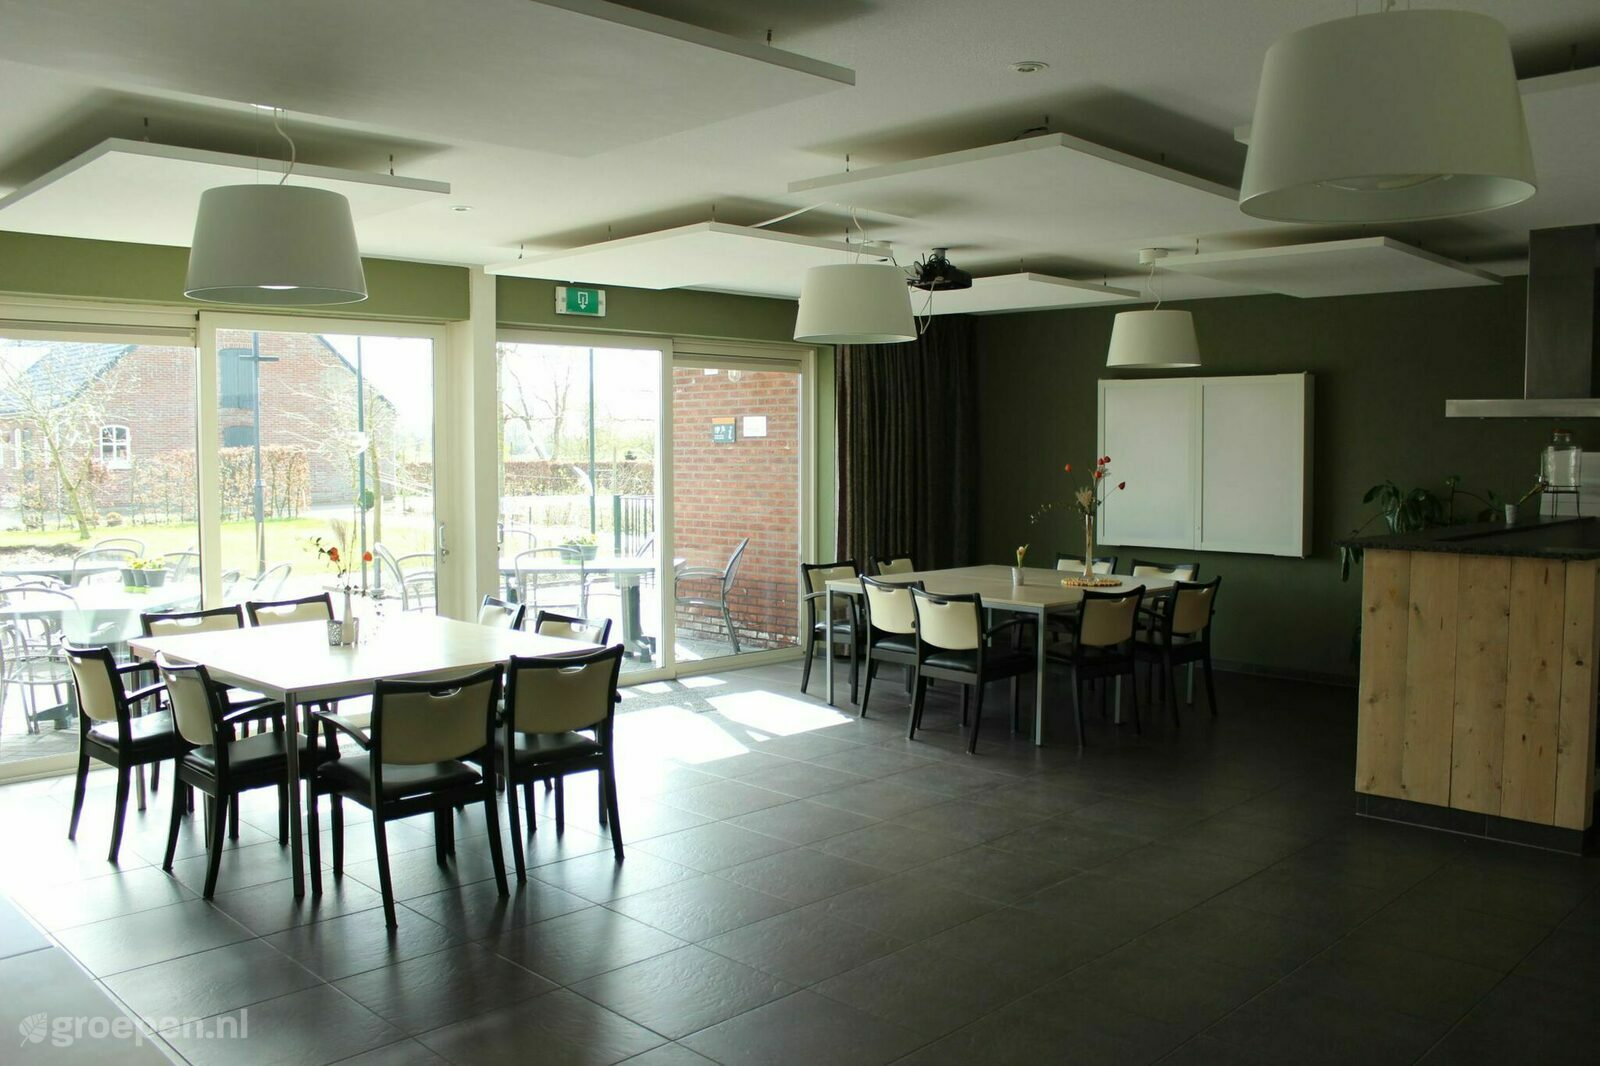 Group accommodation Heusden